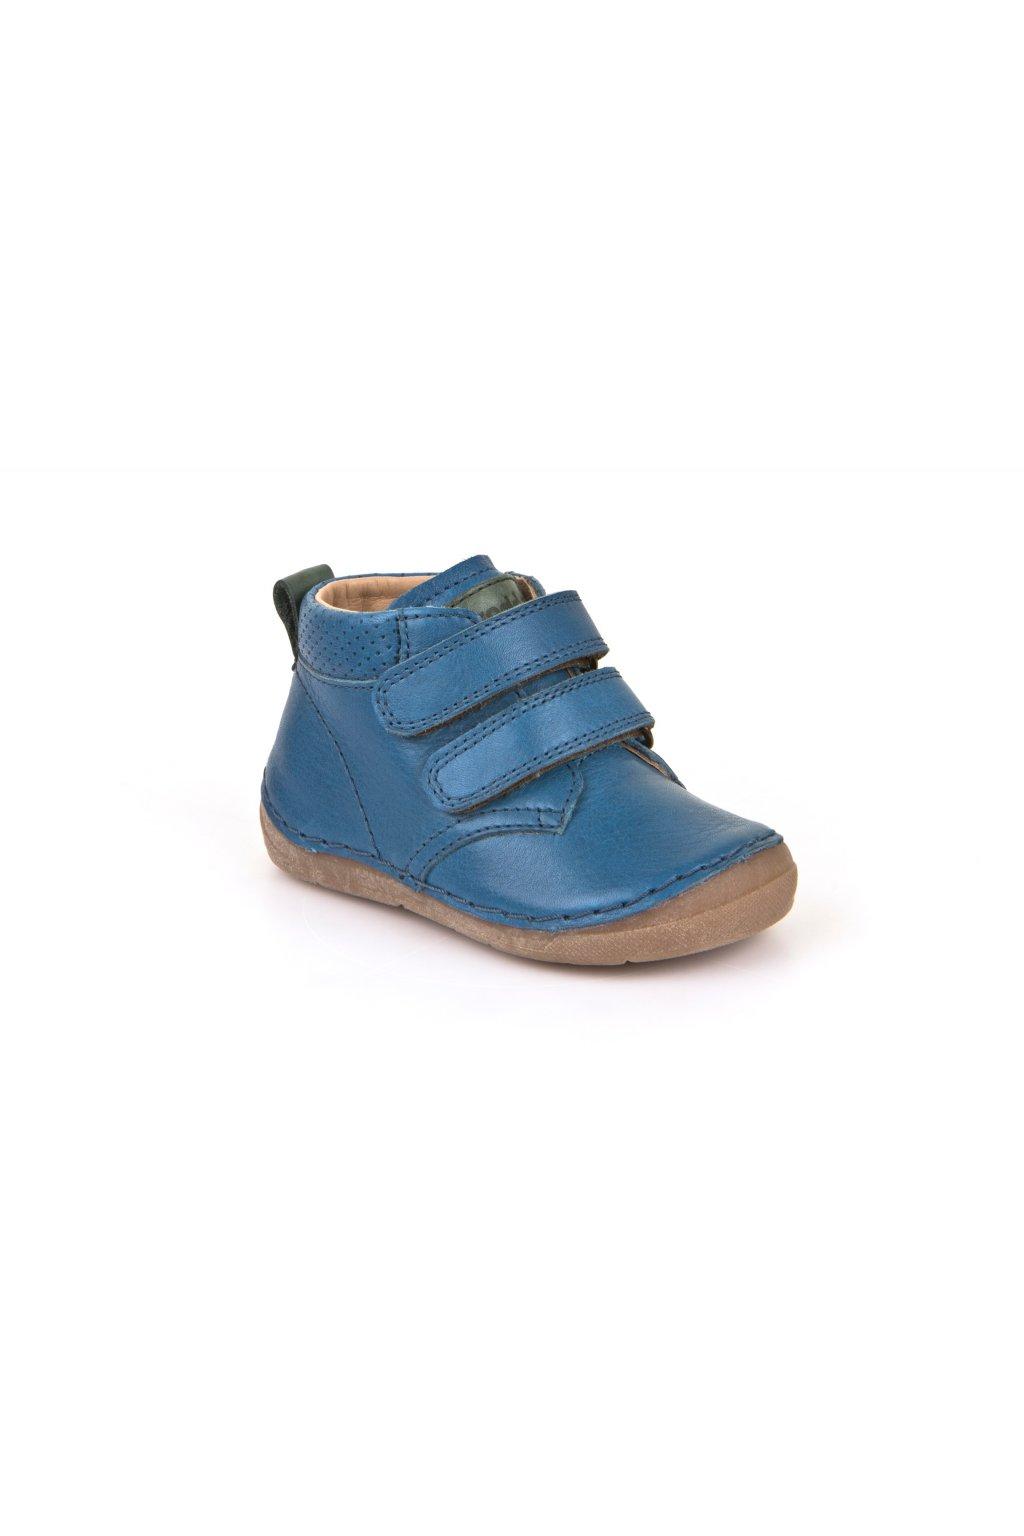 Froddo shoes Dark Denim